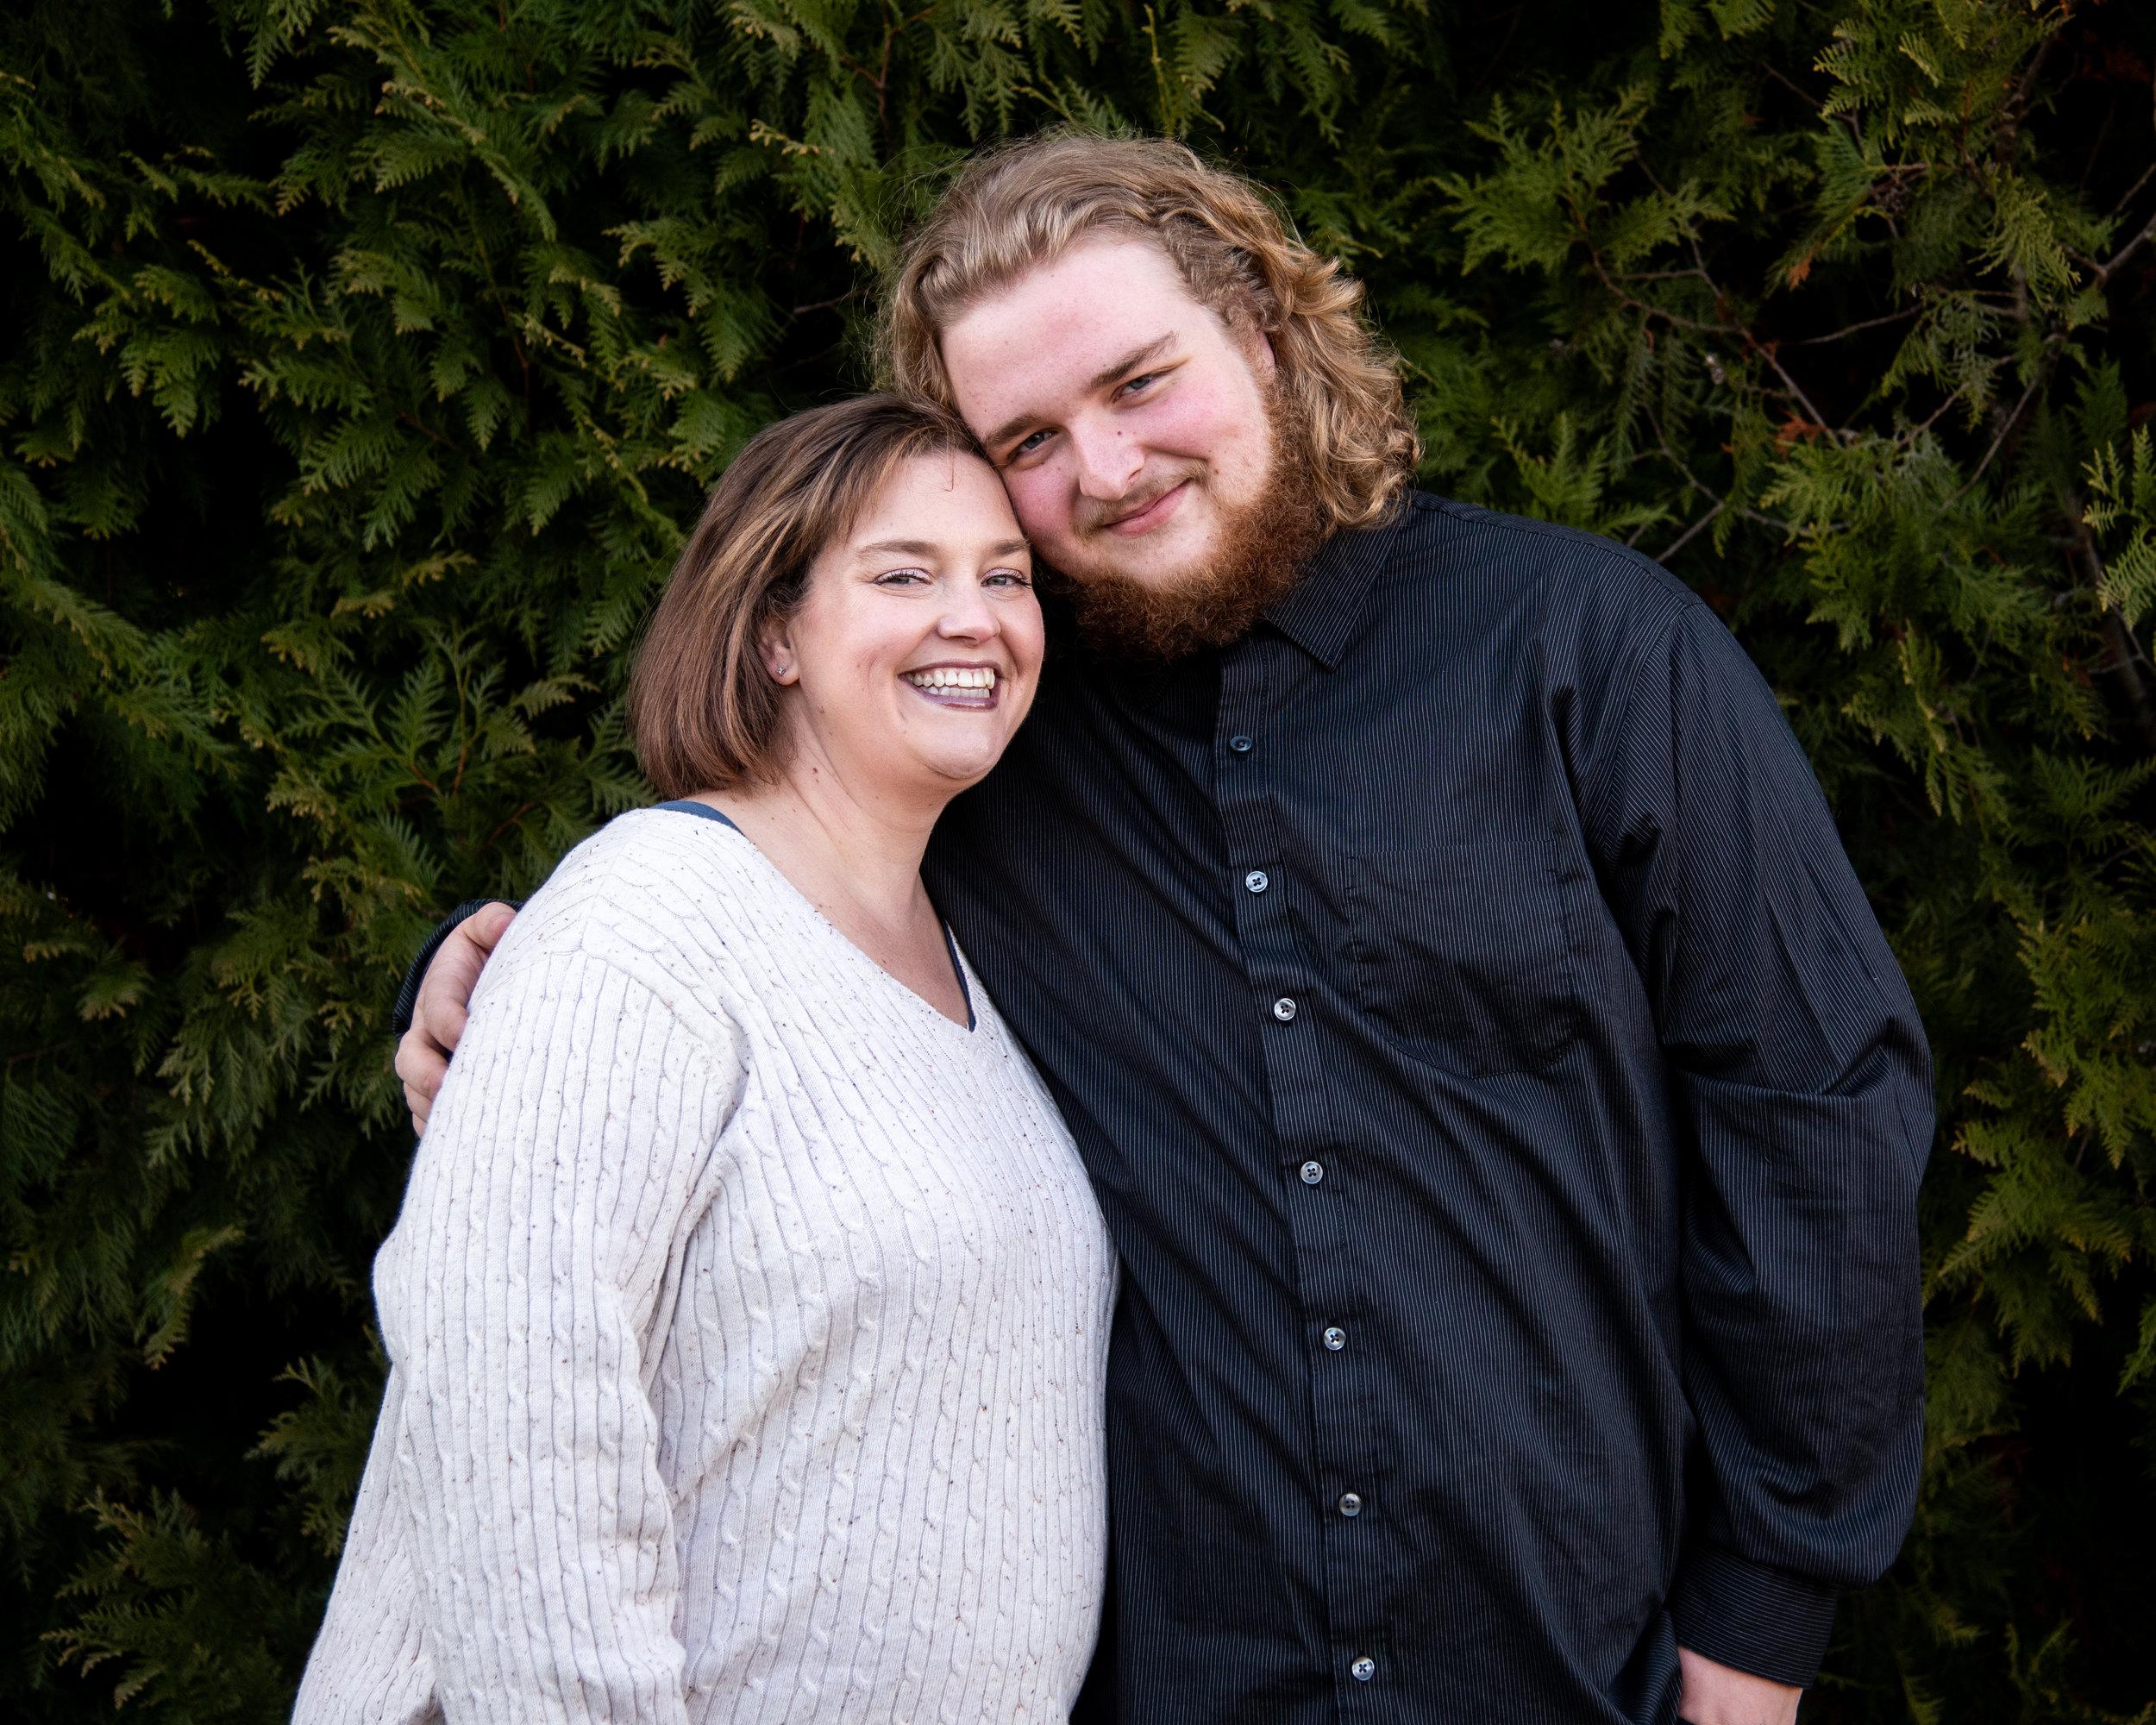 Kyla Jo Photography // Muncie Indiana Photographer // Family Photos // Whitetail Tree Farm // Mother and Son Photo // Winter Photo Shoot // Christmas Tree Farm Photo Session